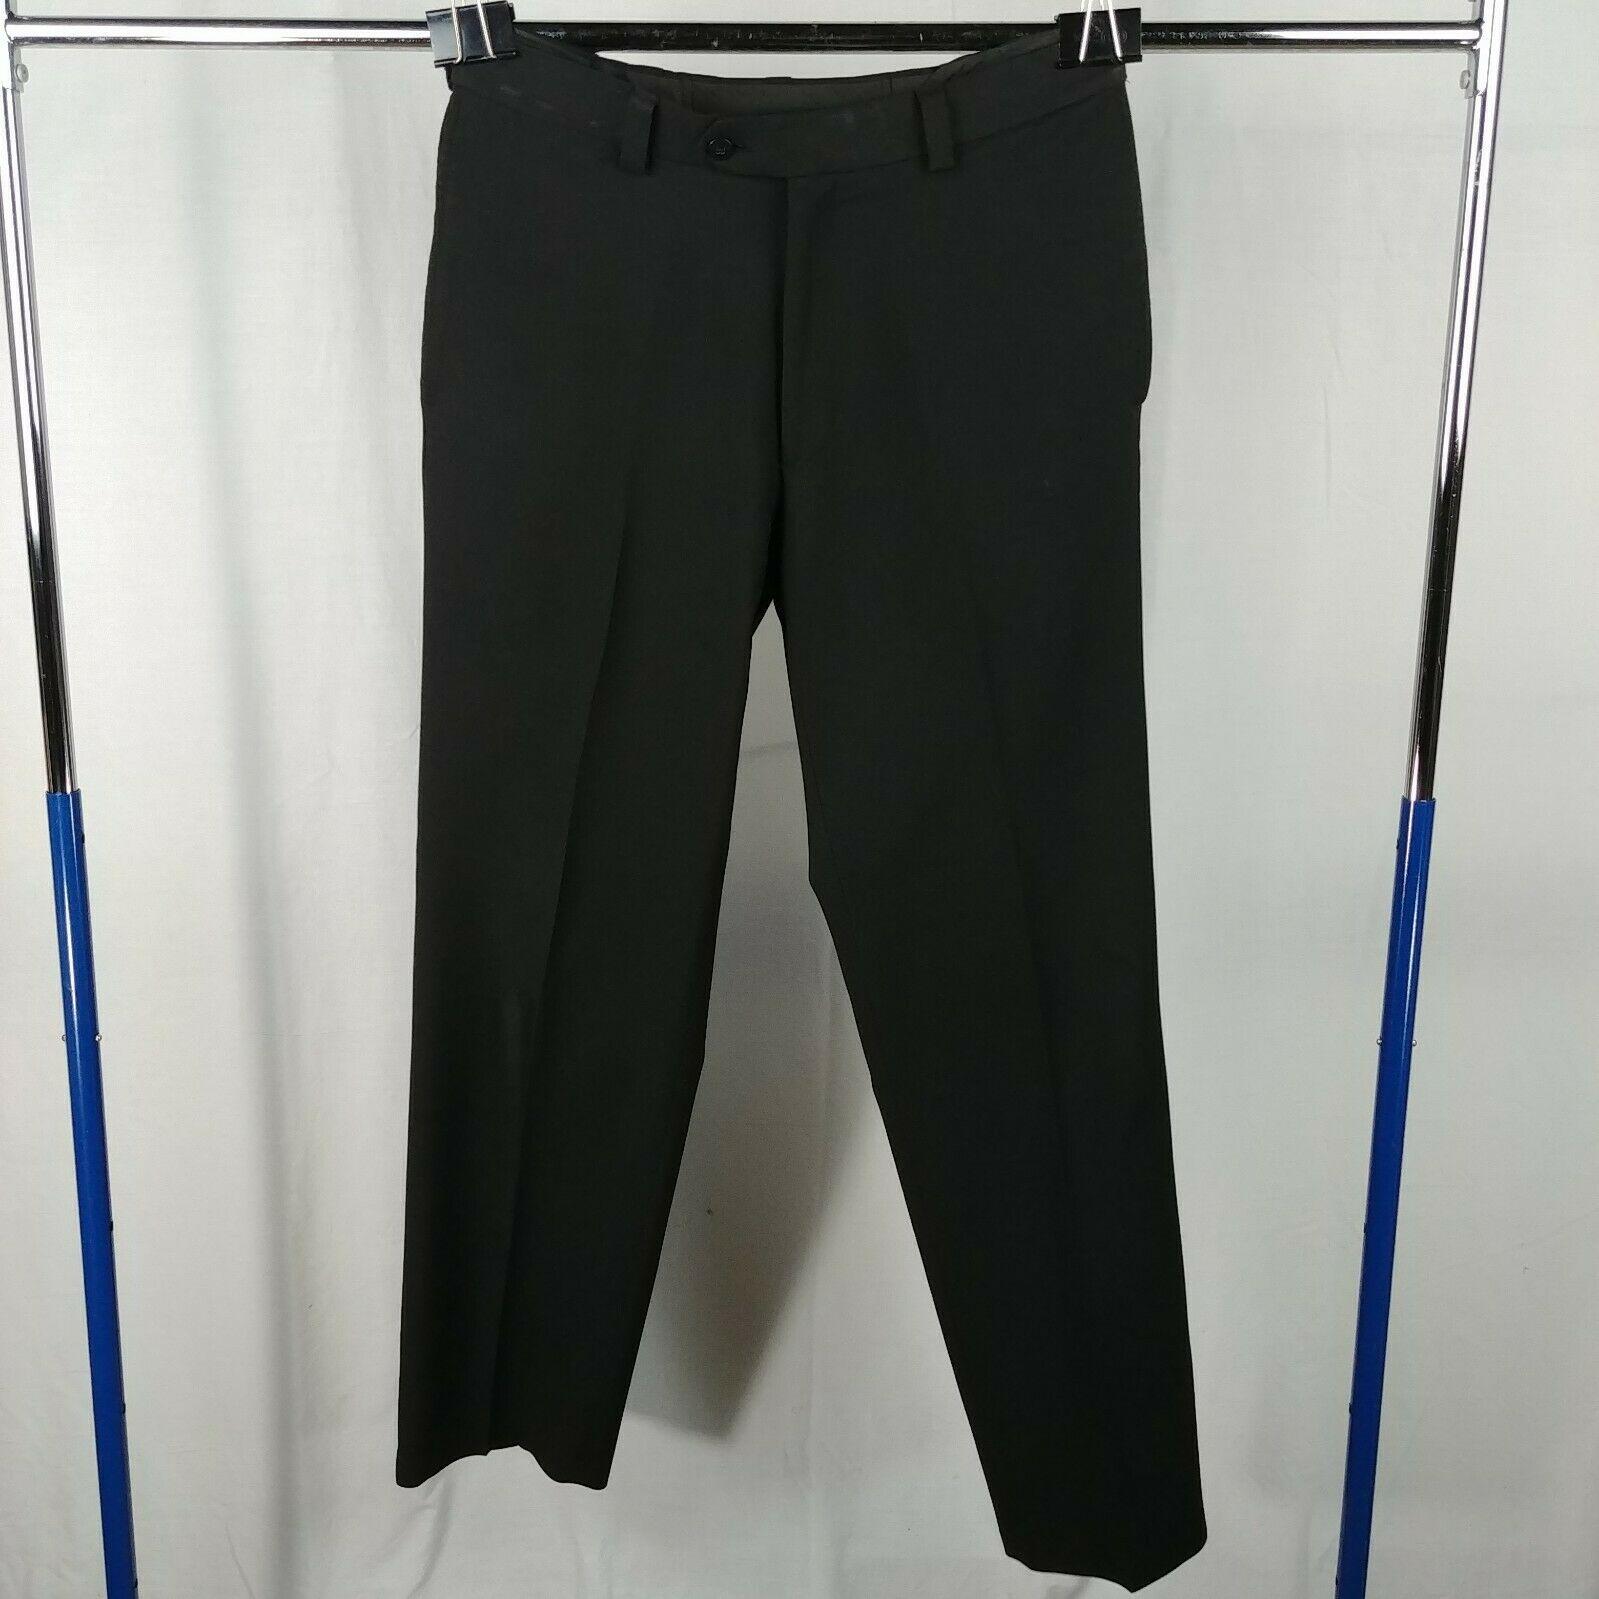 3a54f043f05 Haggar Denim Dress Pants - Data Dynamic AG